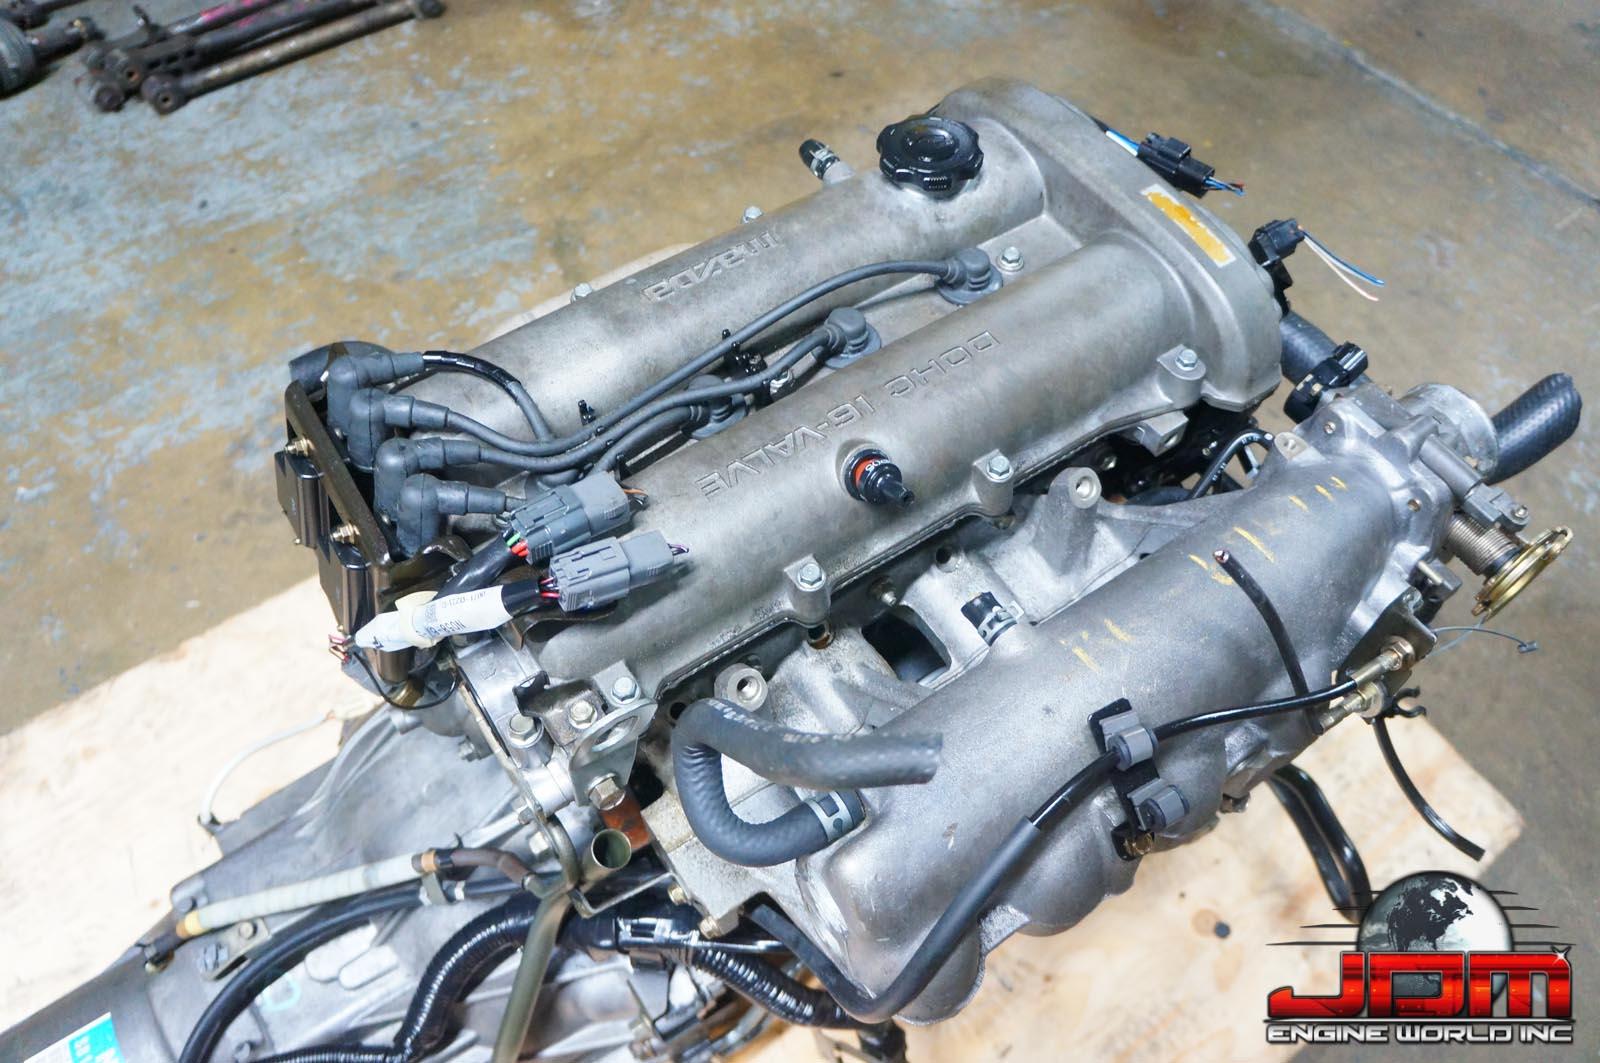 JDM B6 99-00 ENGINE WITH AUTOMATIC TRANSMISSION